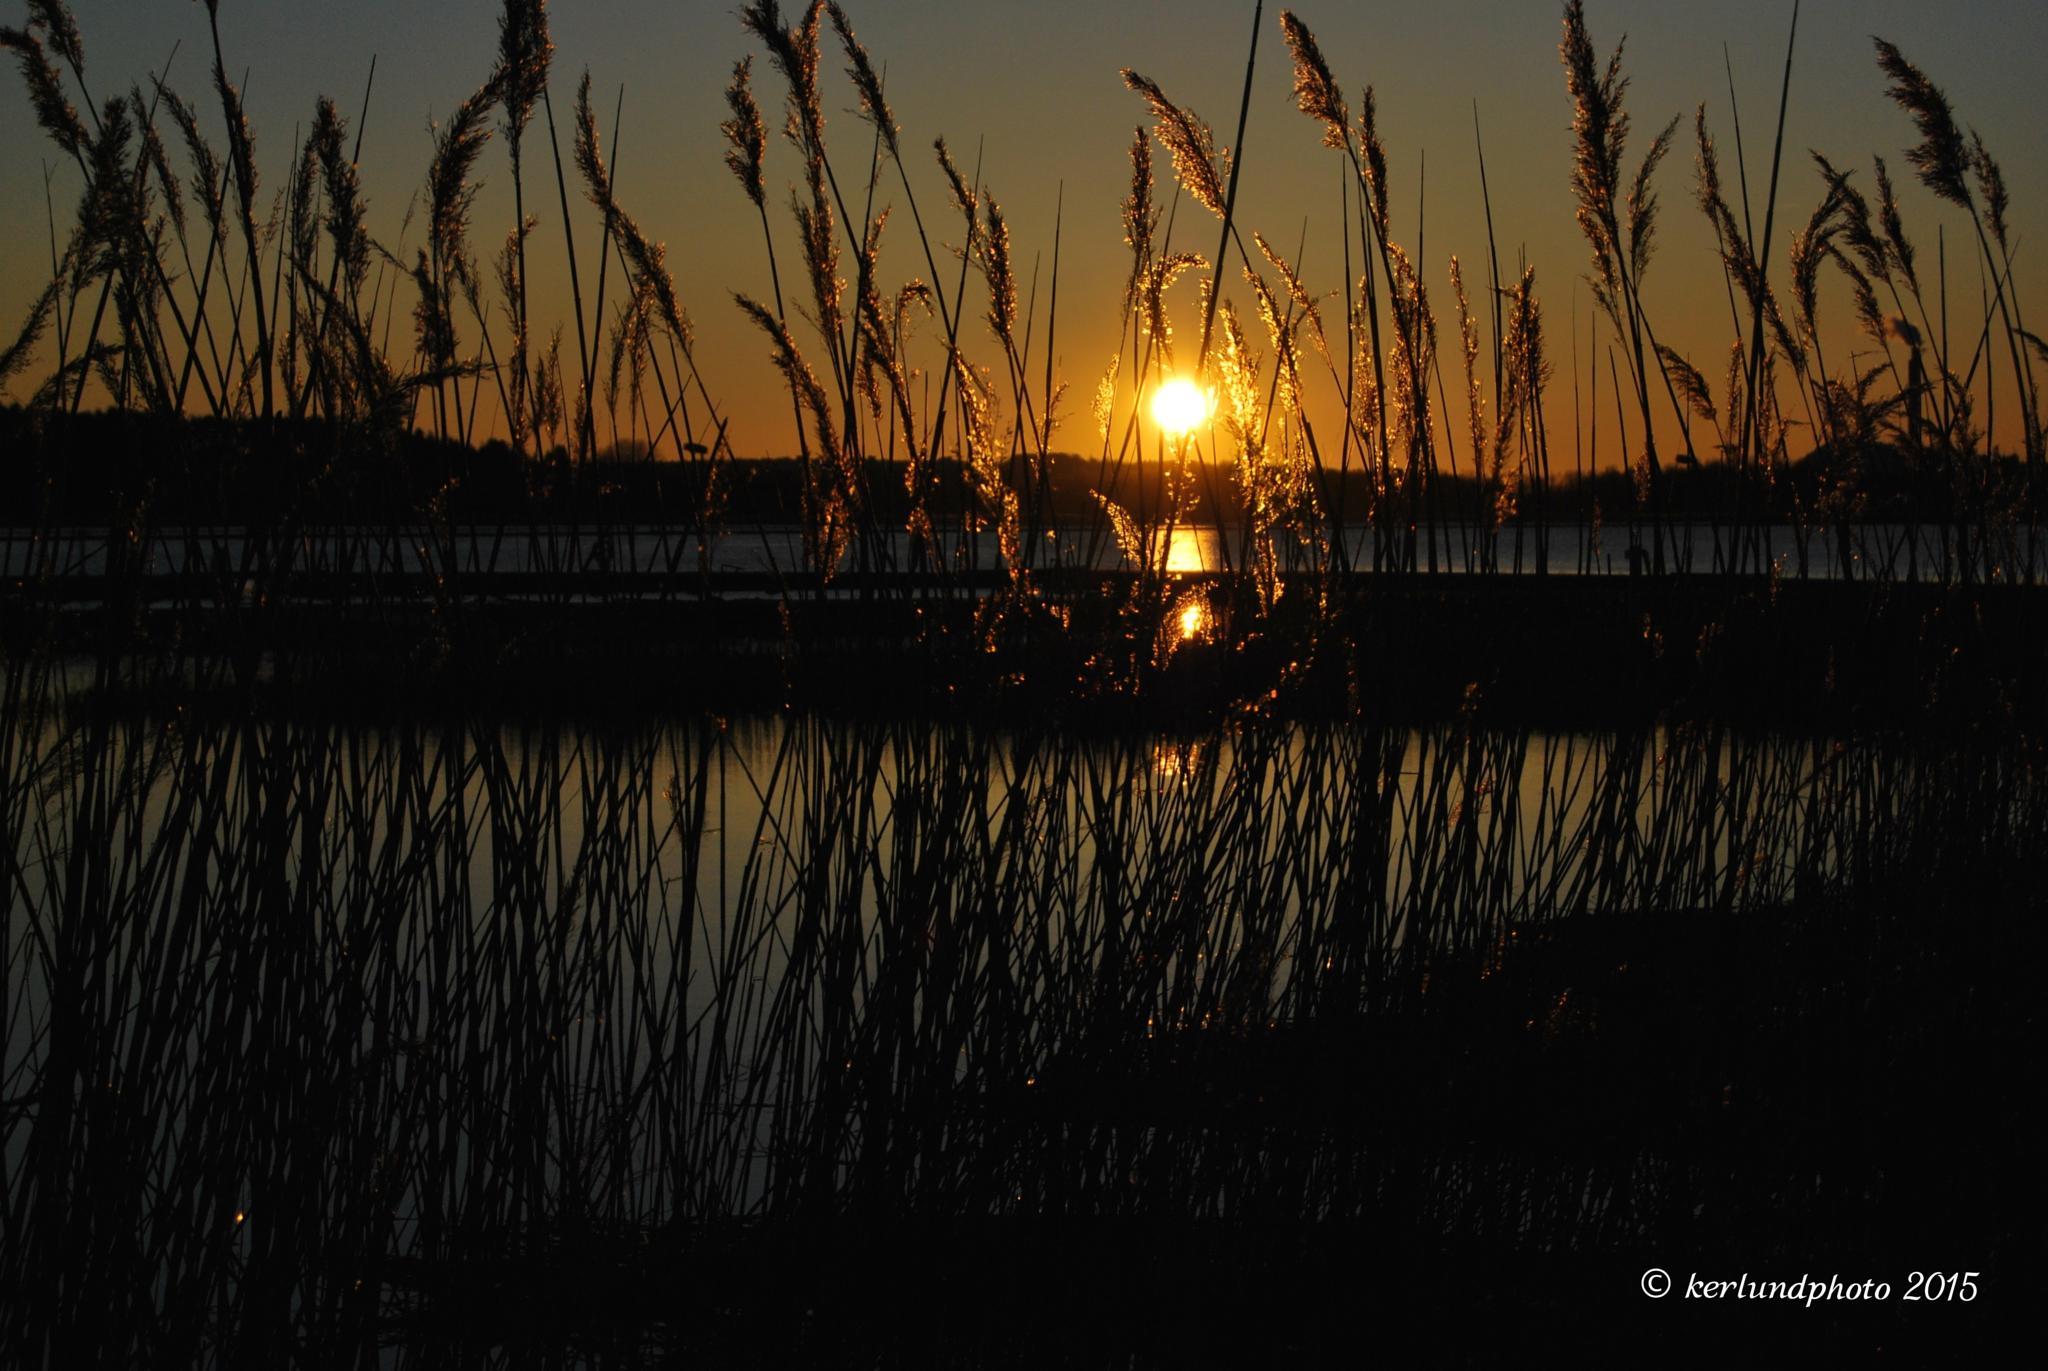 Evening sun by Kerlundphoto